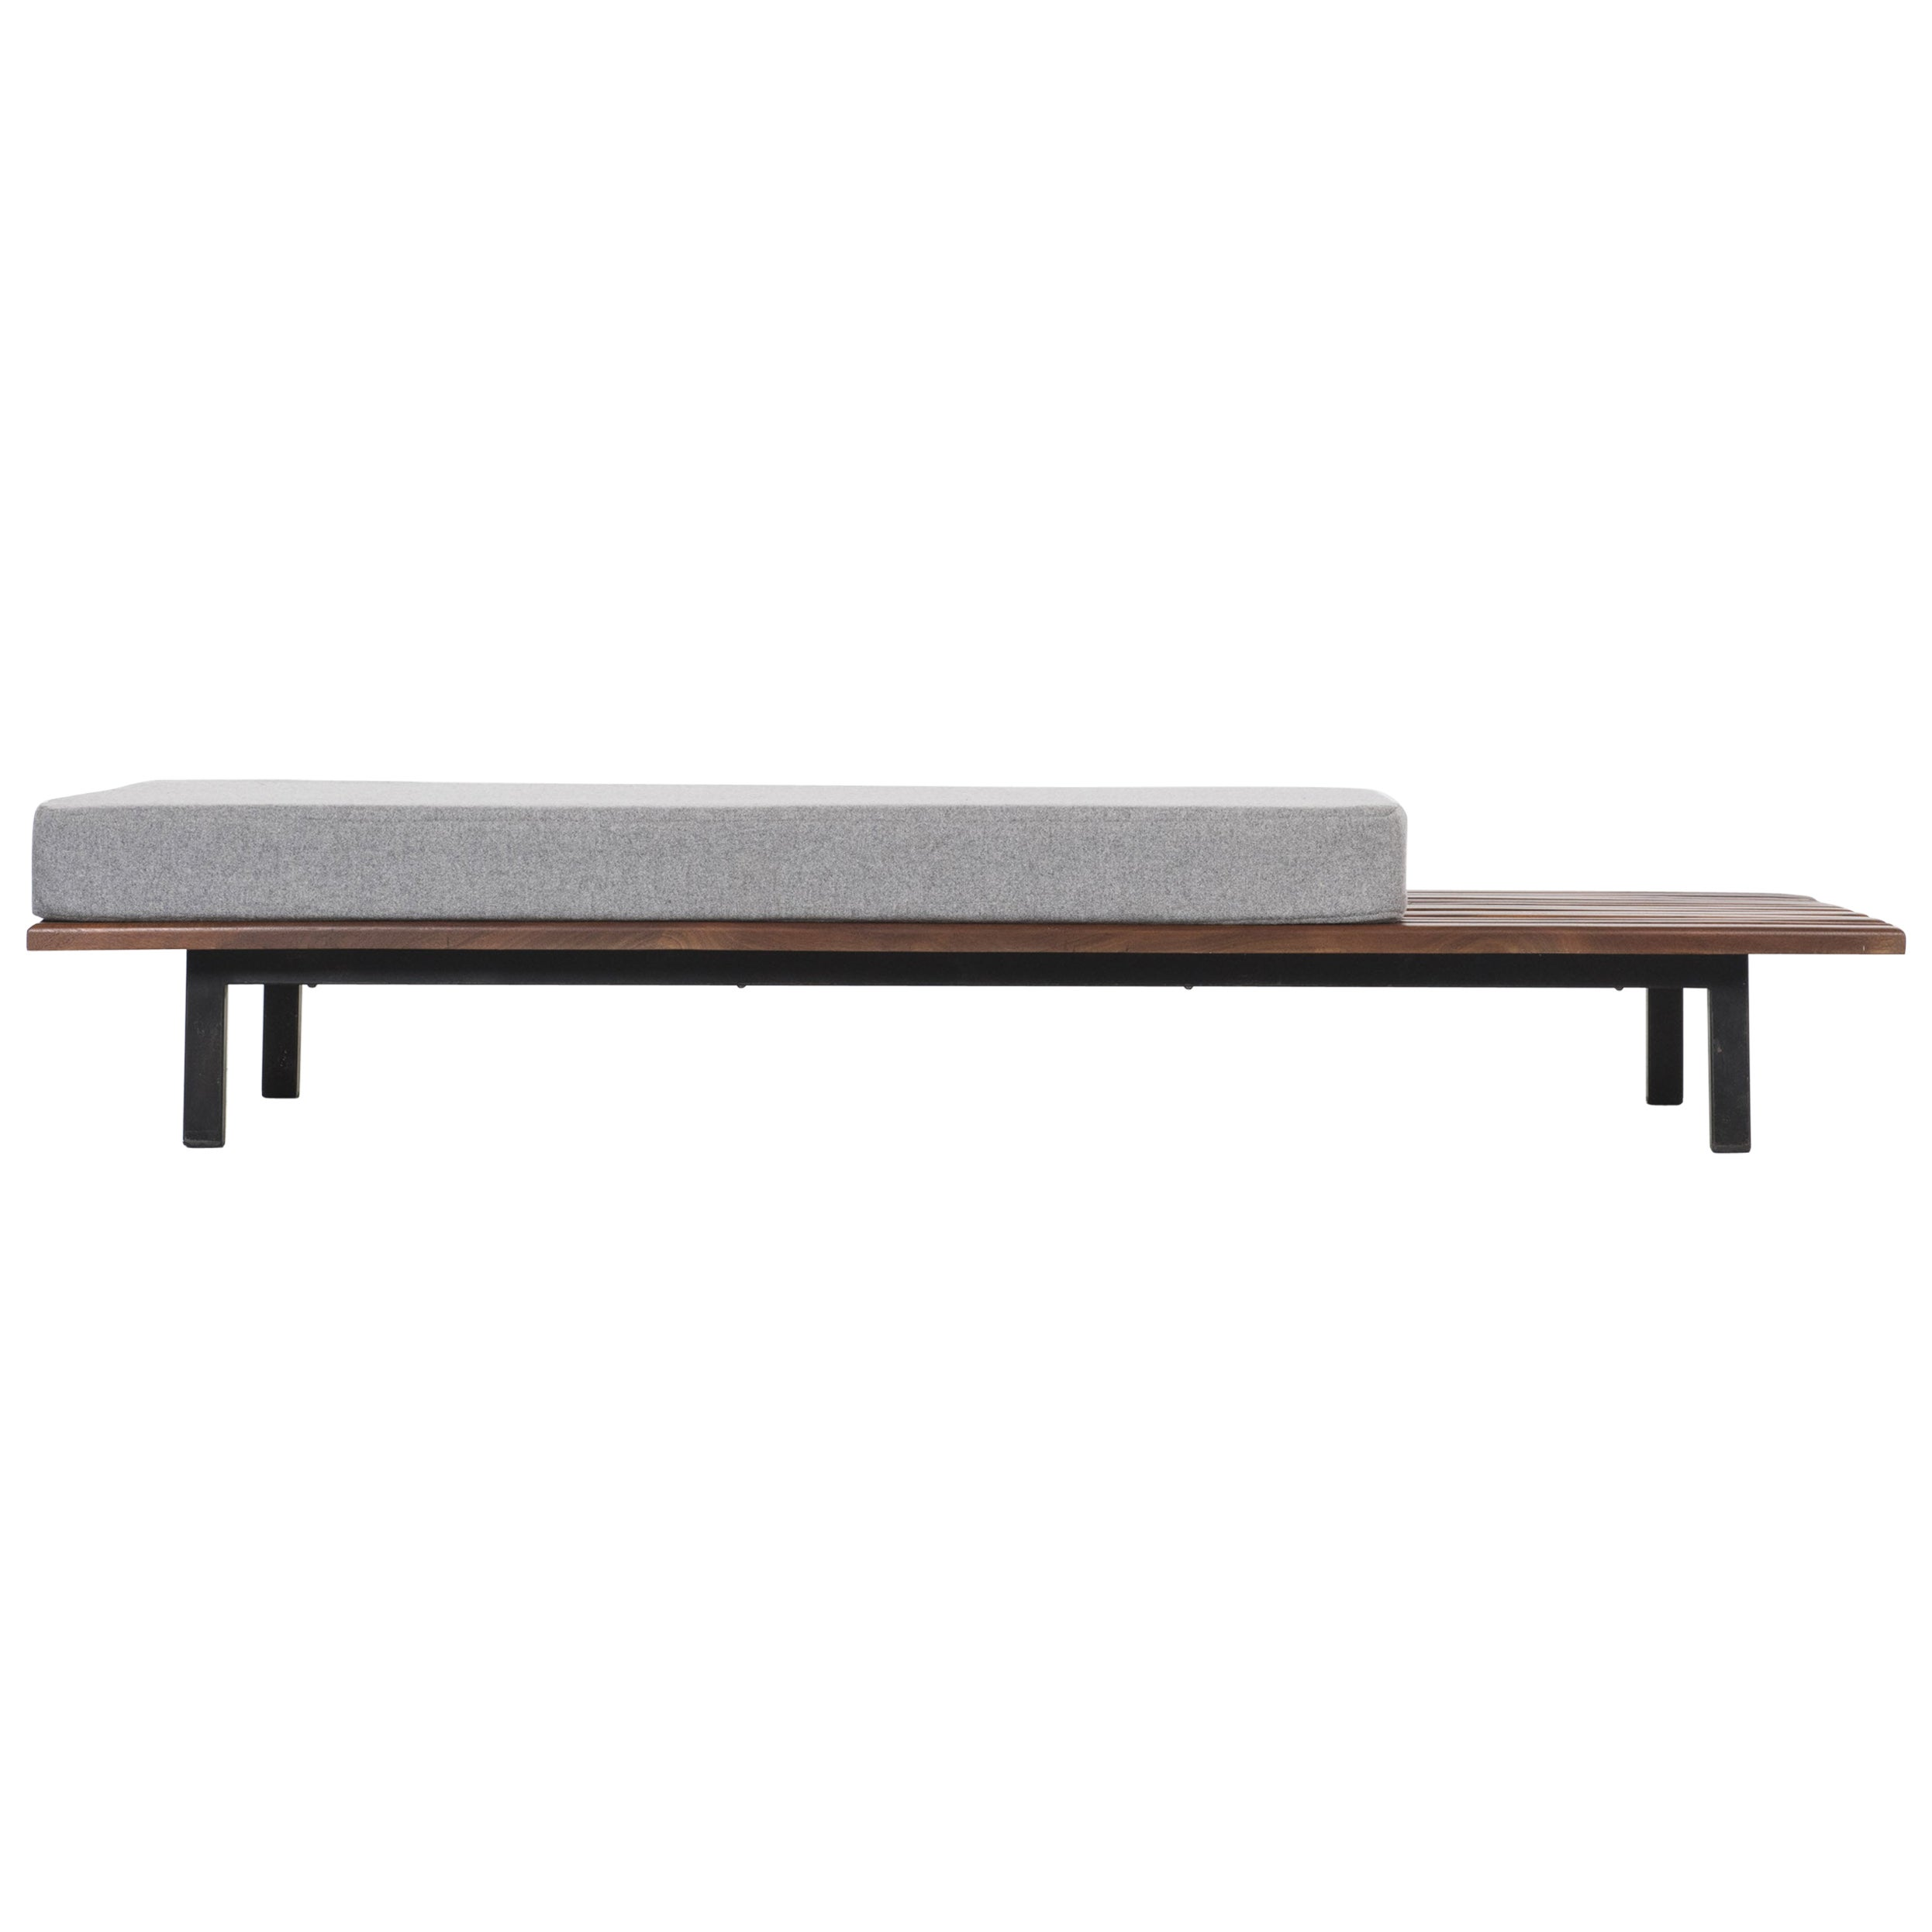 Terrific African Benches 63 For Sale At 1Stdibs Creativecarmelina Interior Chair Design Creativecarmelinacom